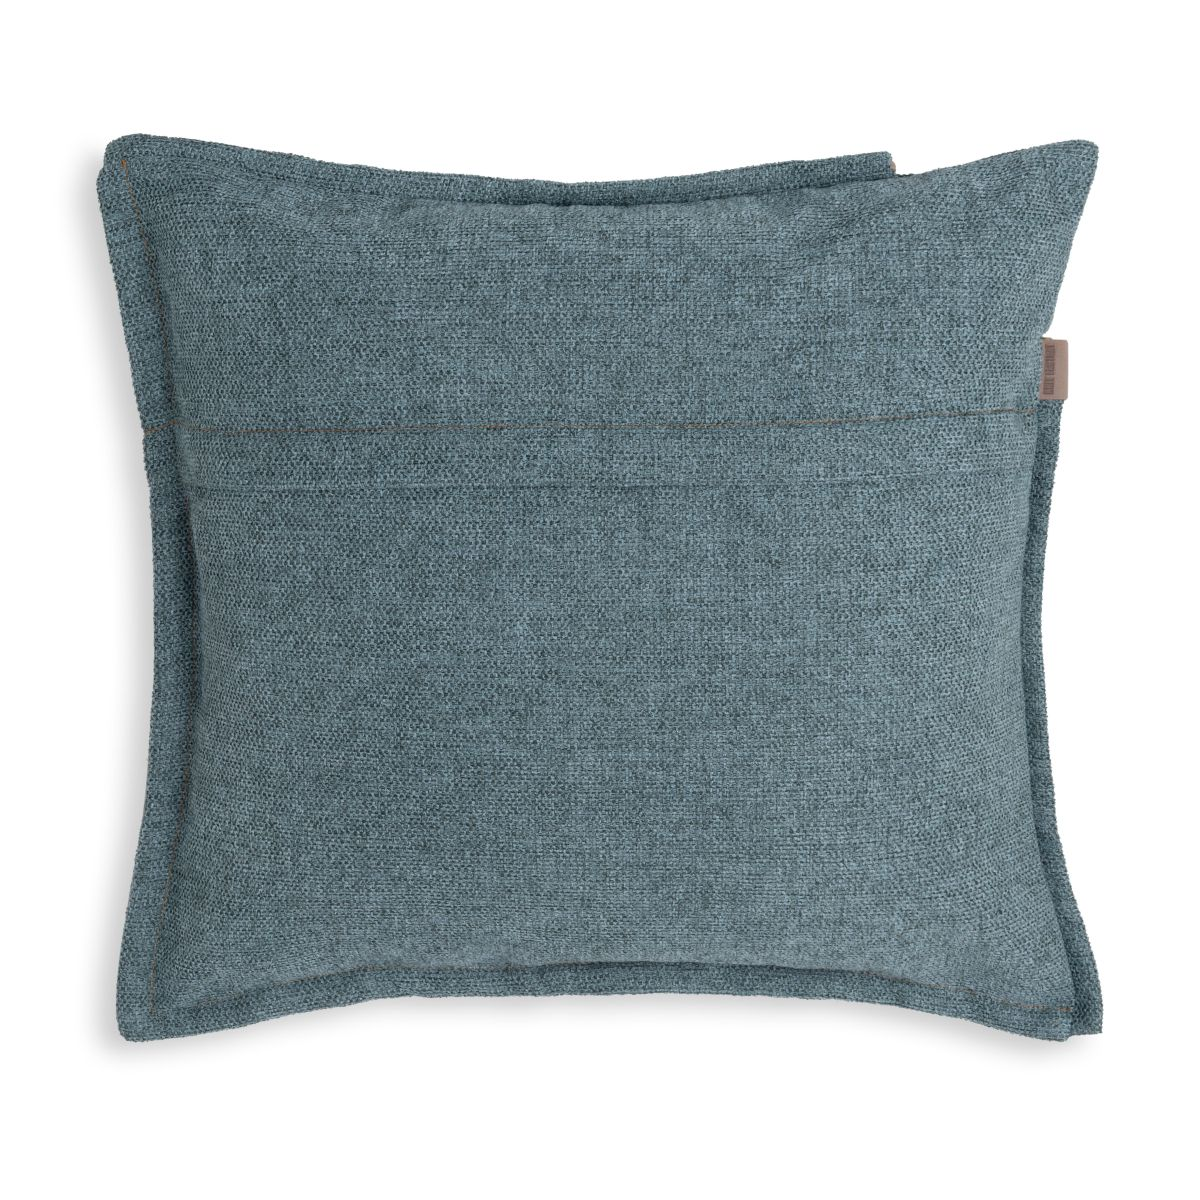 knit factory kf153012013 imre kussen jeans 50x50 2